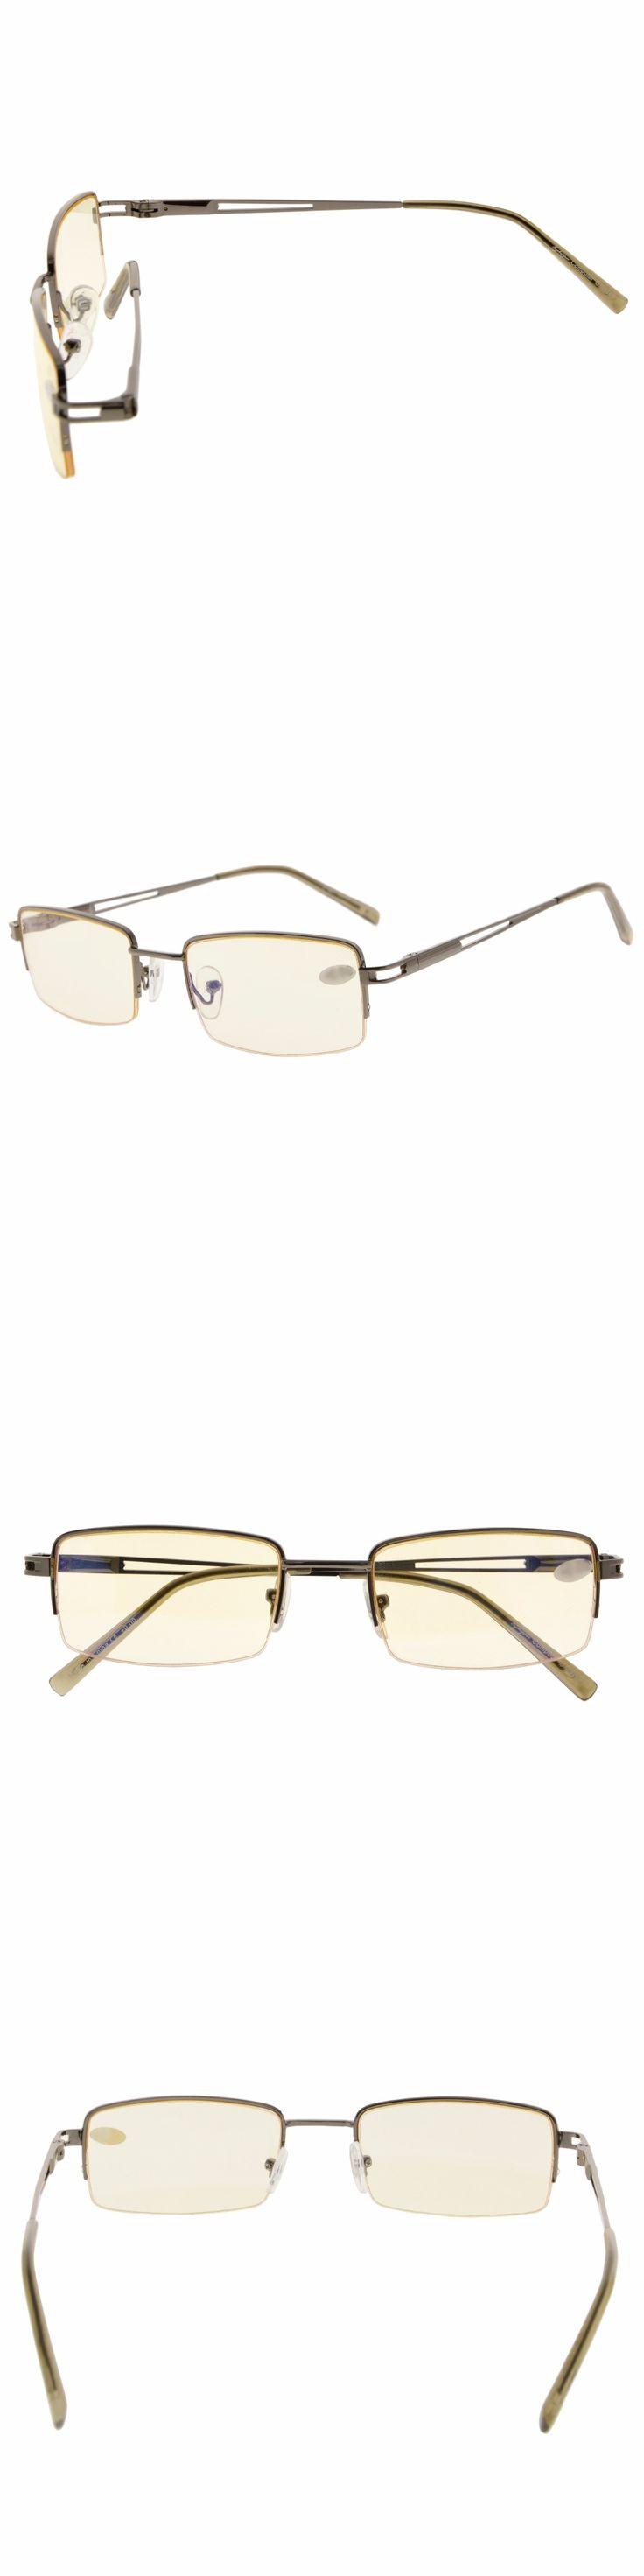 CG15014 Eyekepper Rectangle Metal Half-rim Spring Hinges Computer Readers Reading Glasses Yellow Tinted Lenses